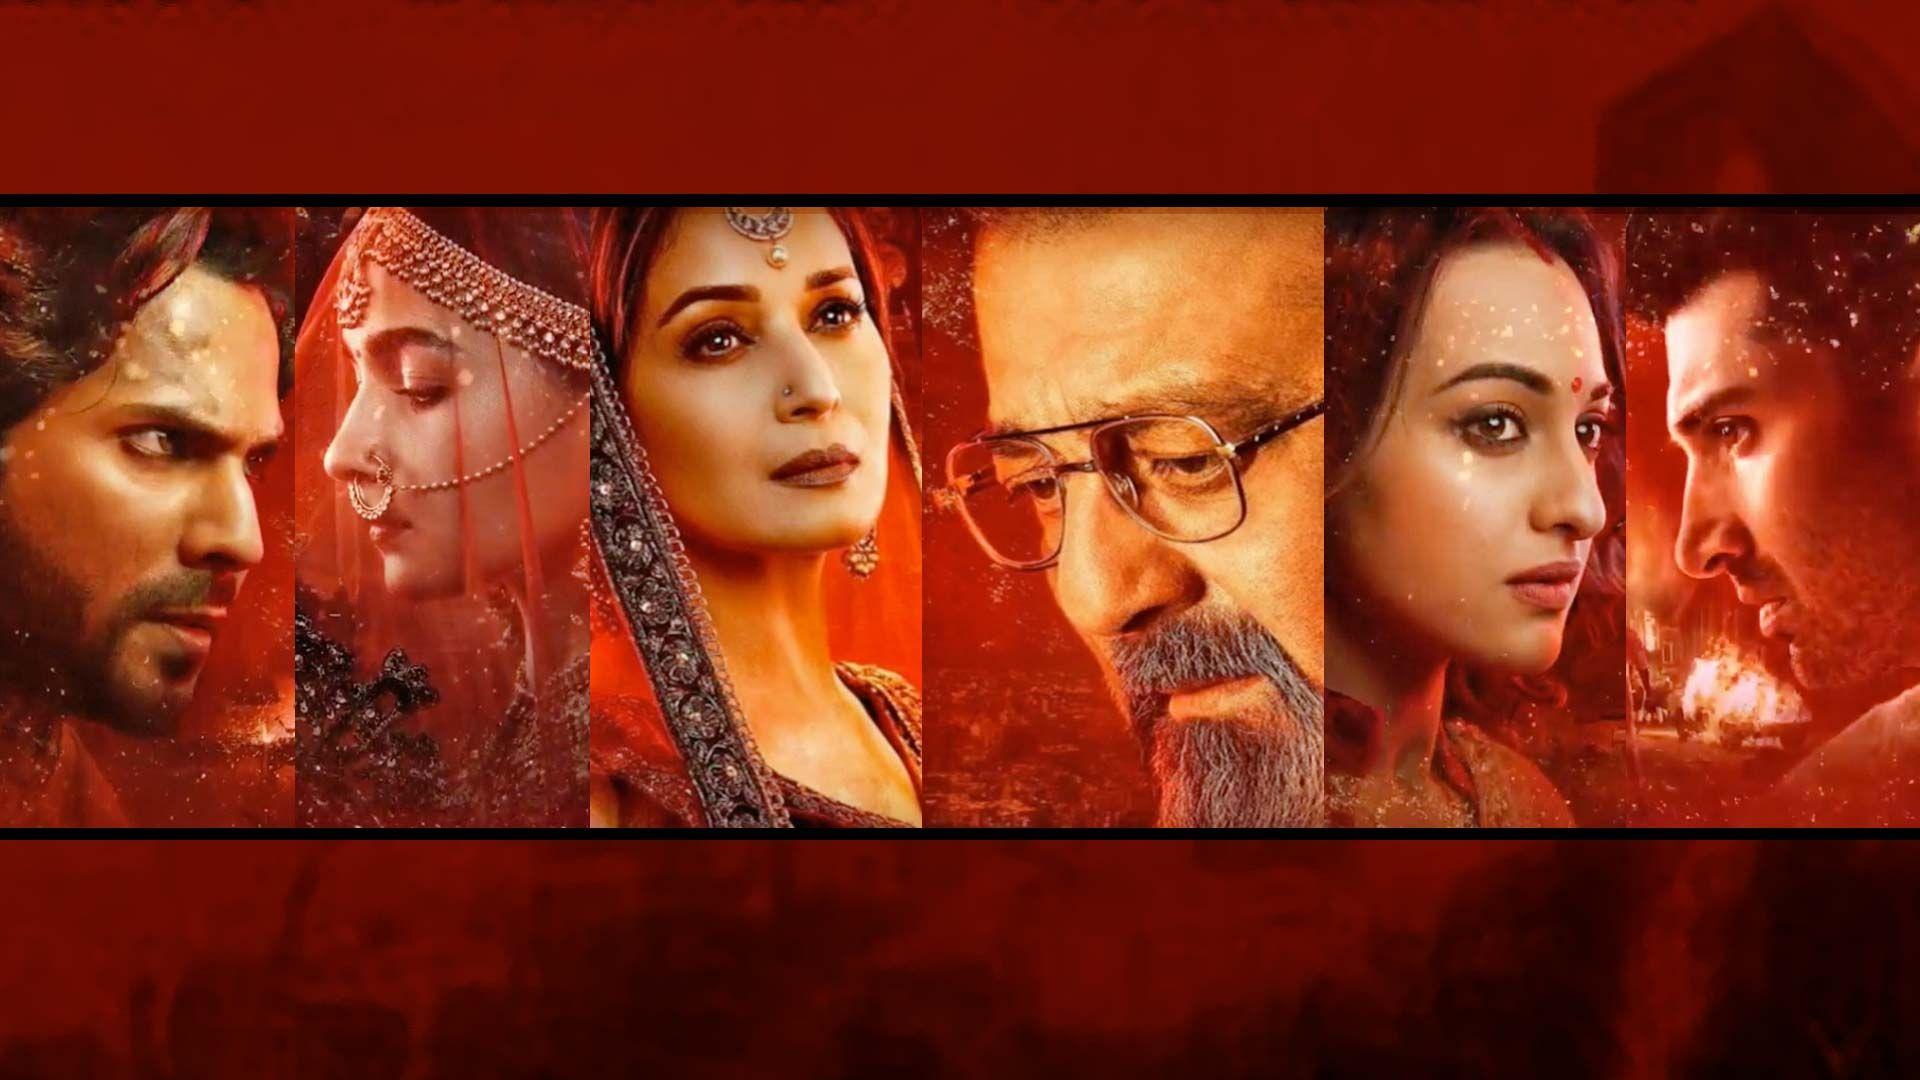 Madhuri Dixit & Sanjay Dutt's New Look From 'Kalank' Looks